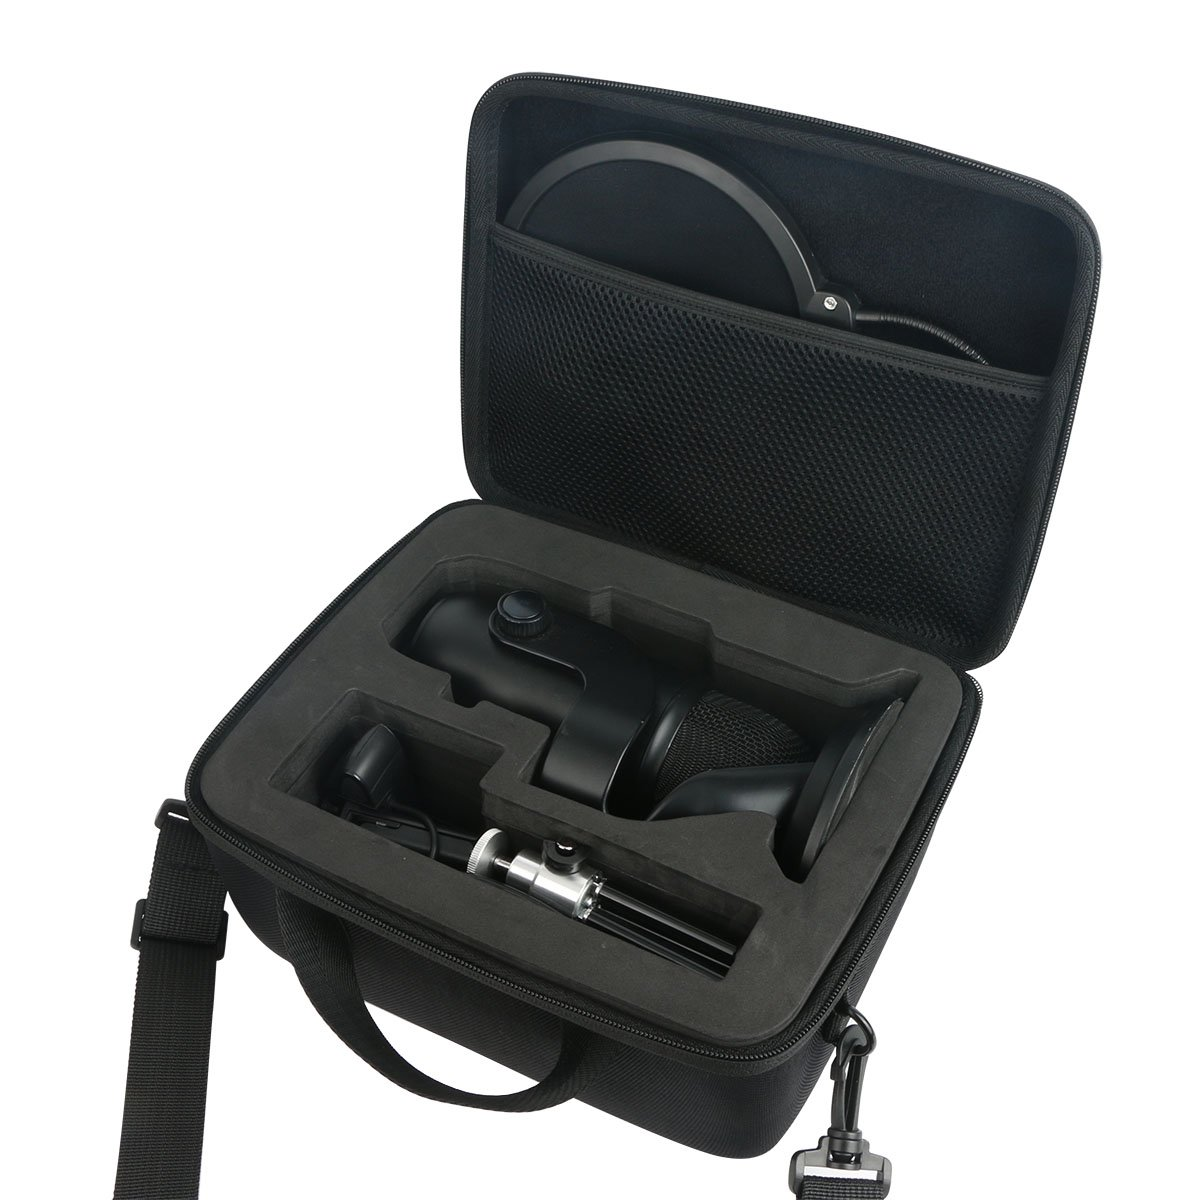 khanka Carrying Bag for Blue Yeti USB Microphone by khanka